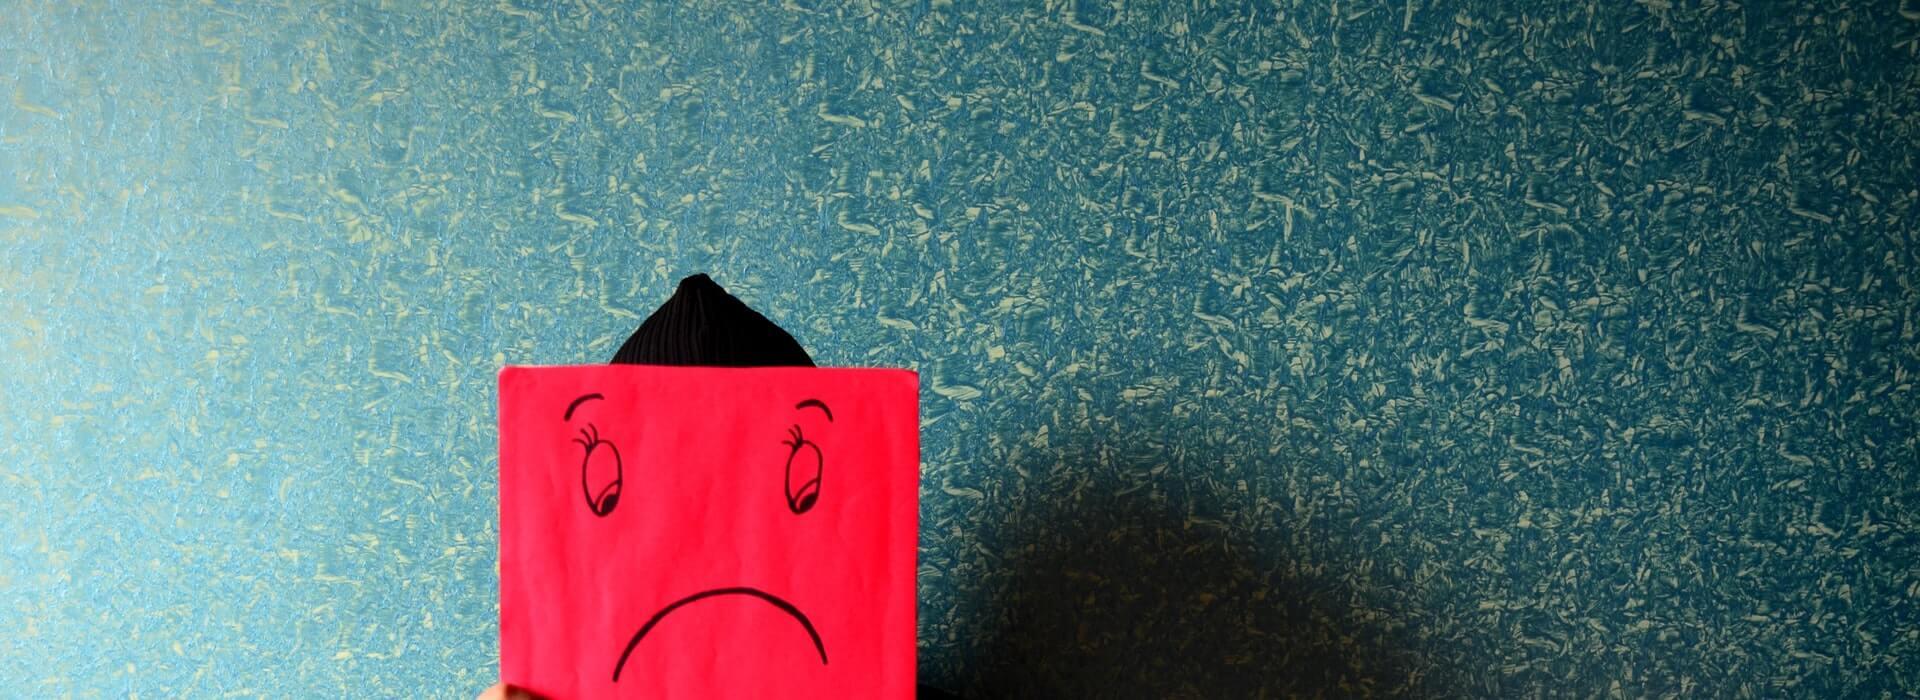 Konflikte-folgen-Depression-Angehörige